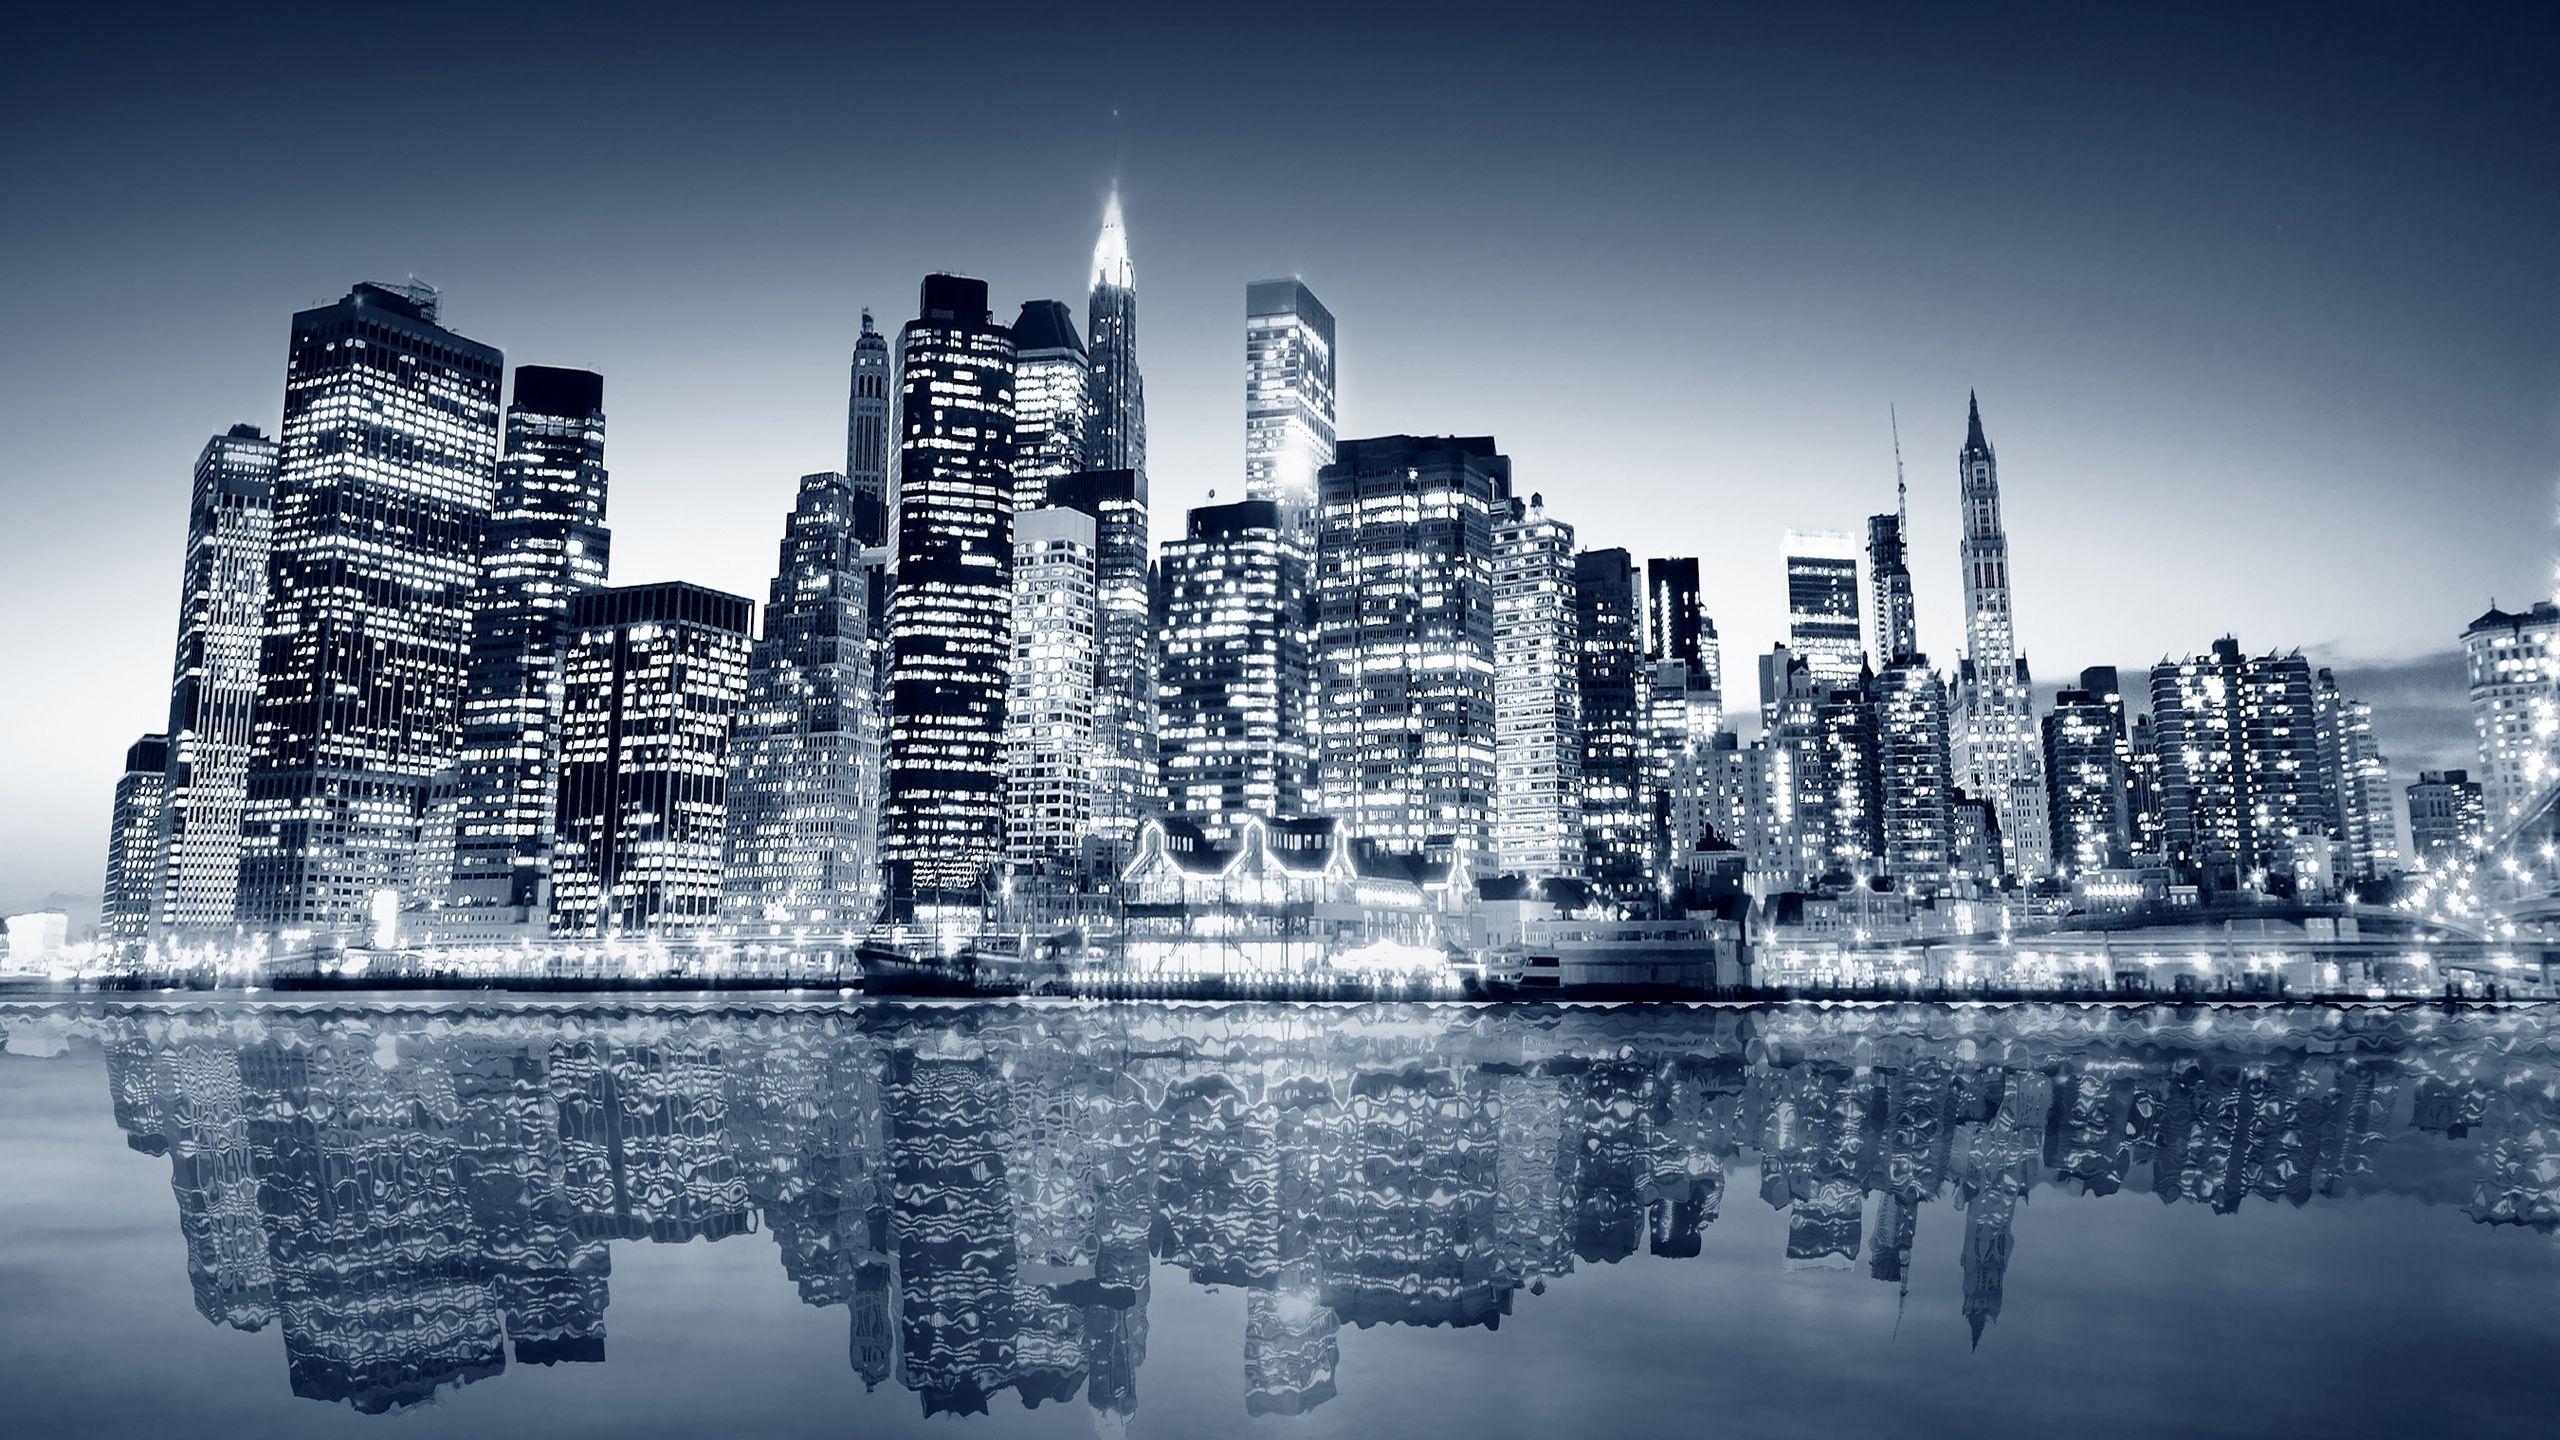 mac imac 27 city wallpapers desktop backgrounds hd downloads all